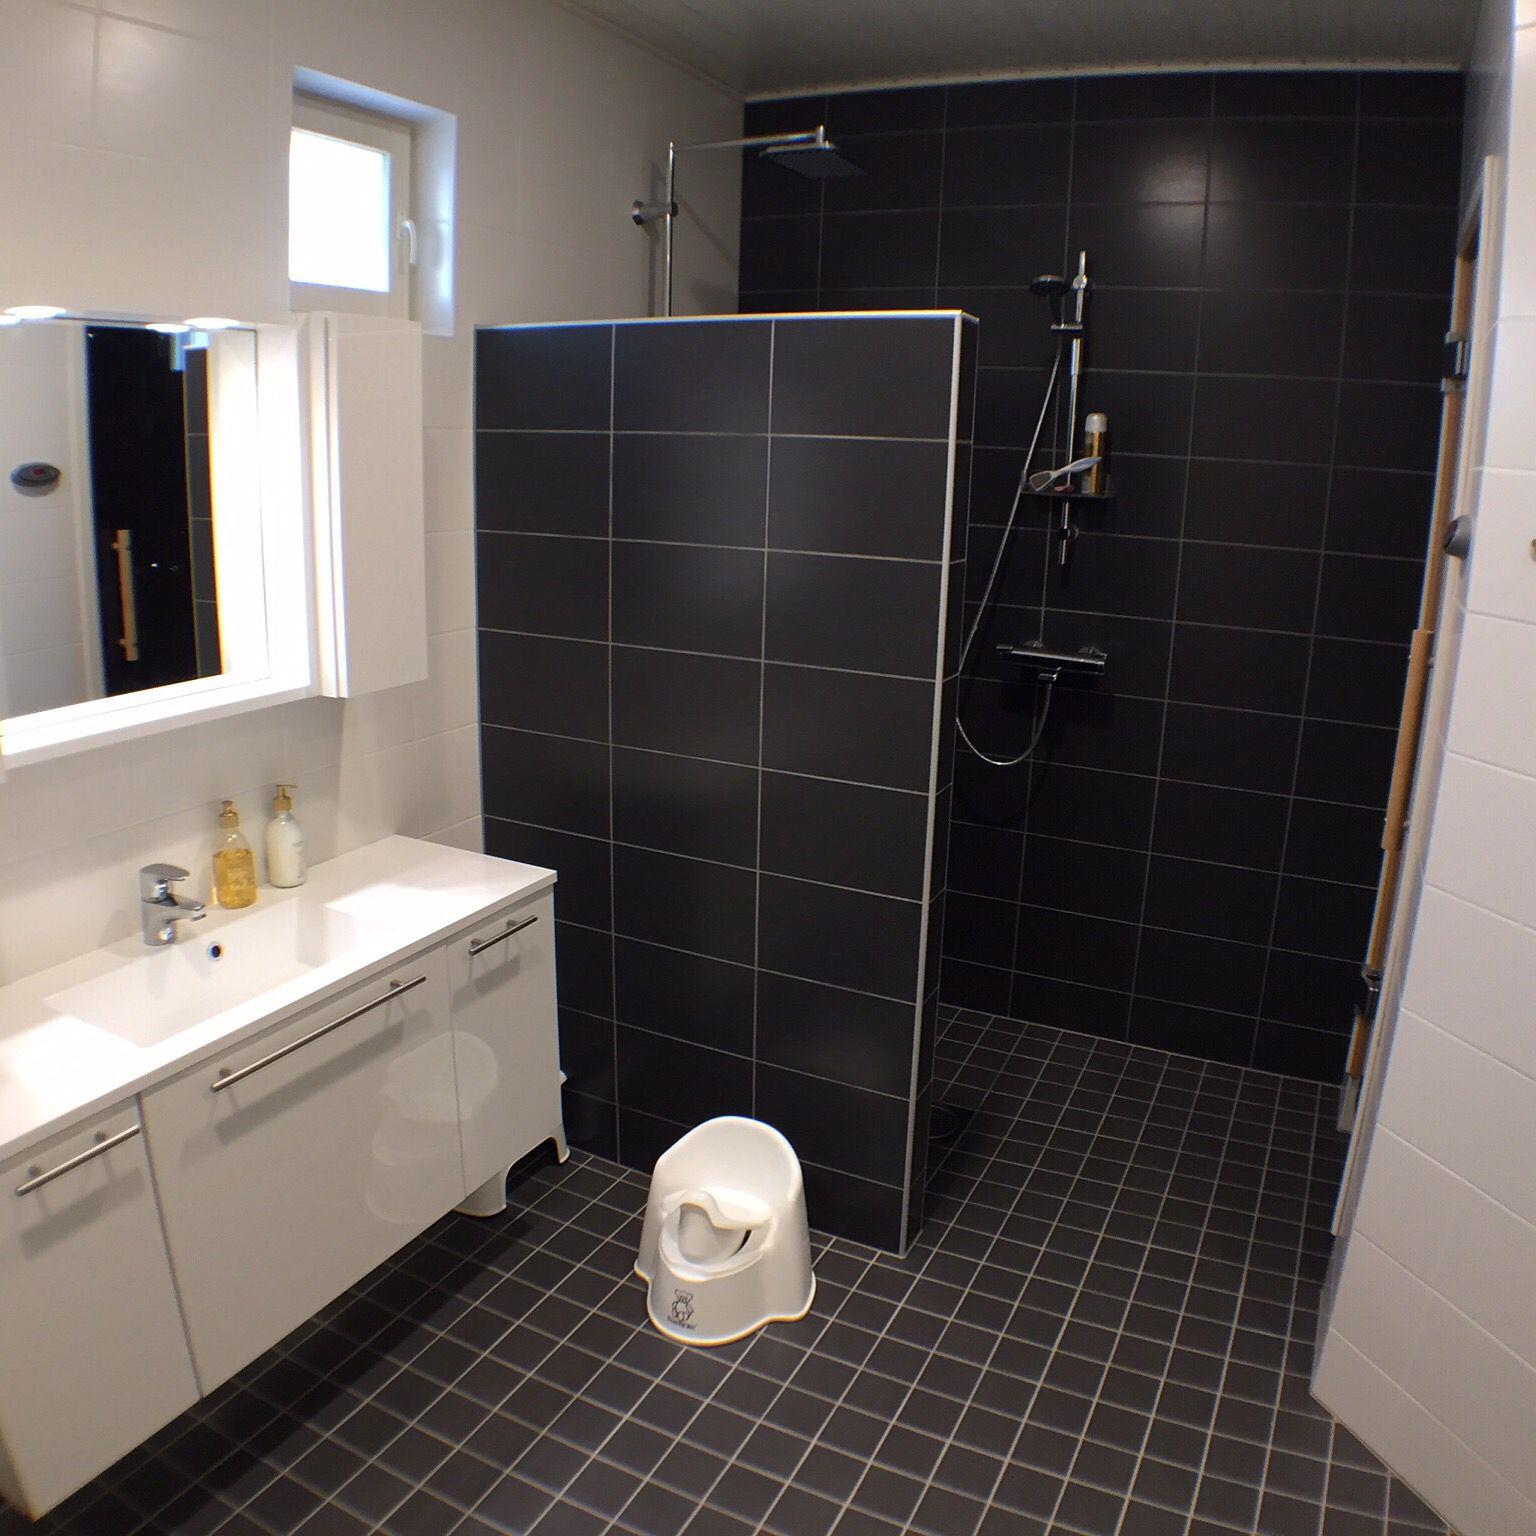 Puustelli bathroom and sauna / badrum och bastu / kylpyhuone ja ...